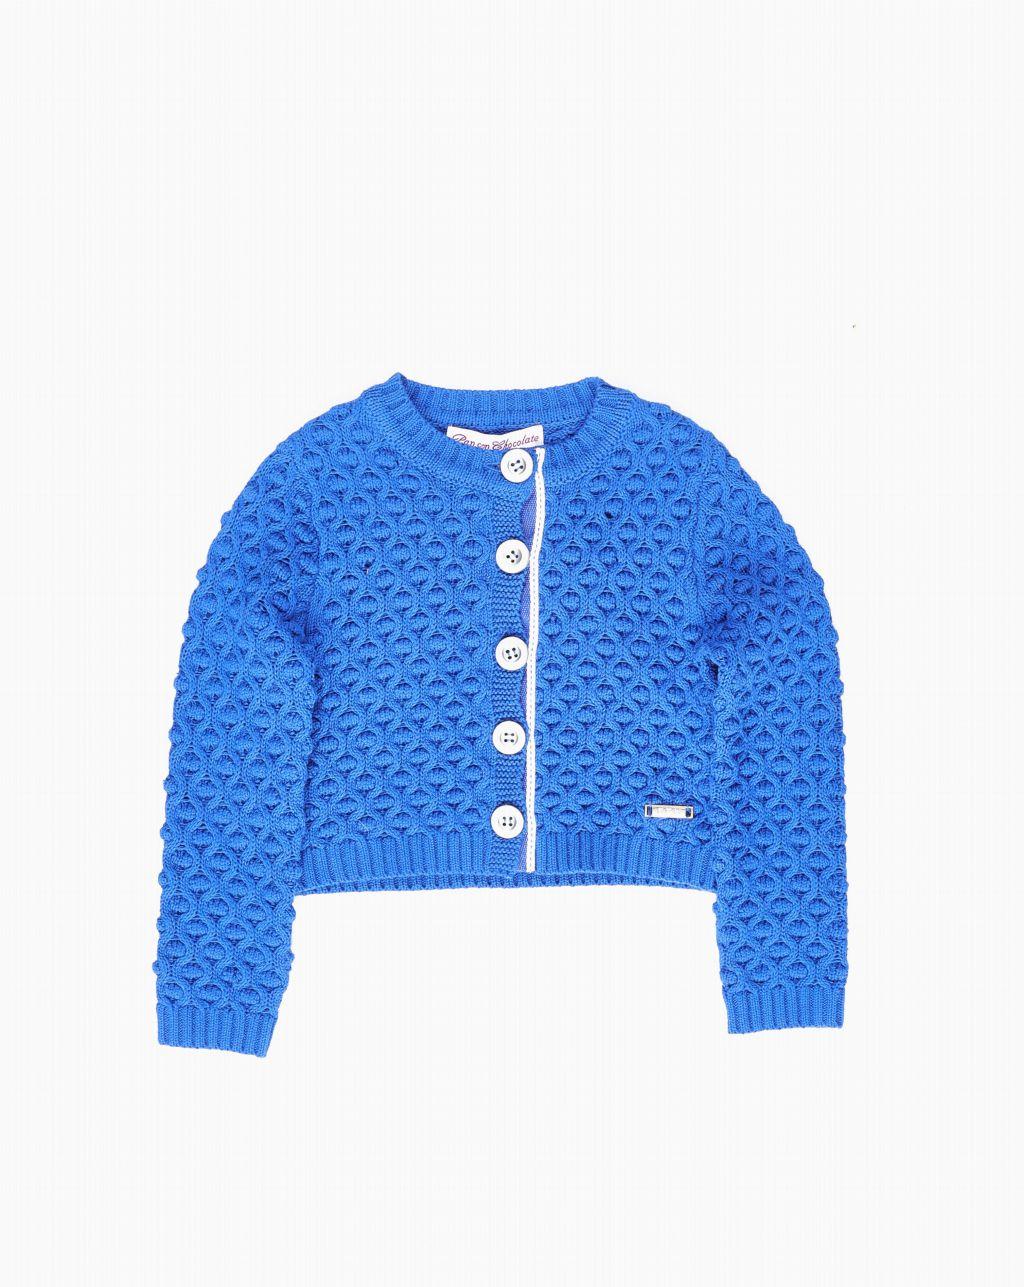 Pan con Chocolate: Chaqueta tricot Caren